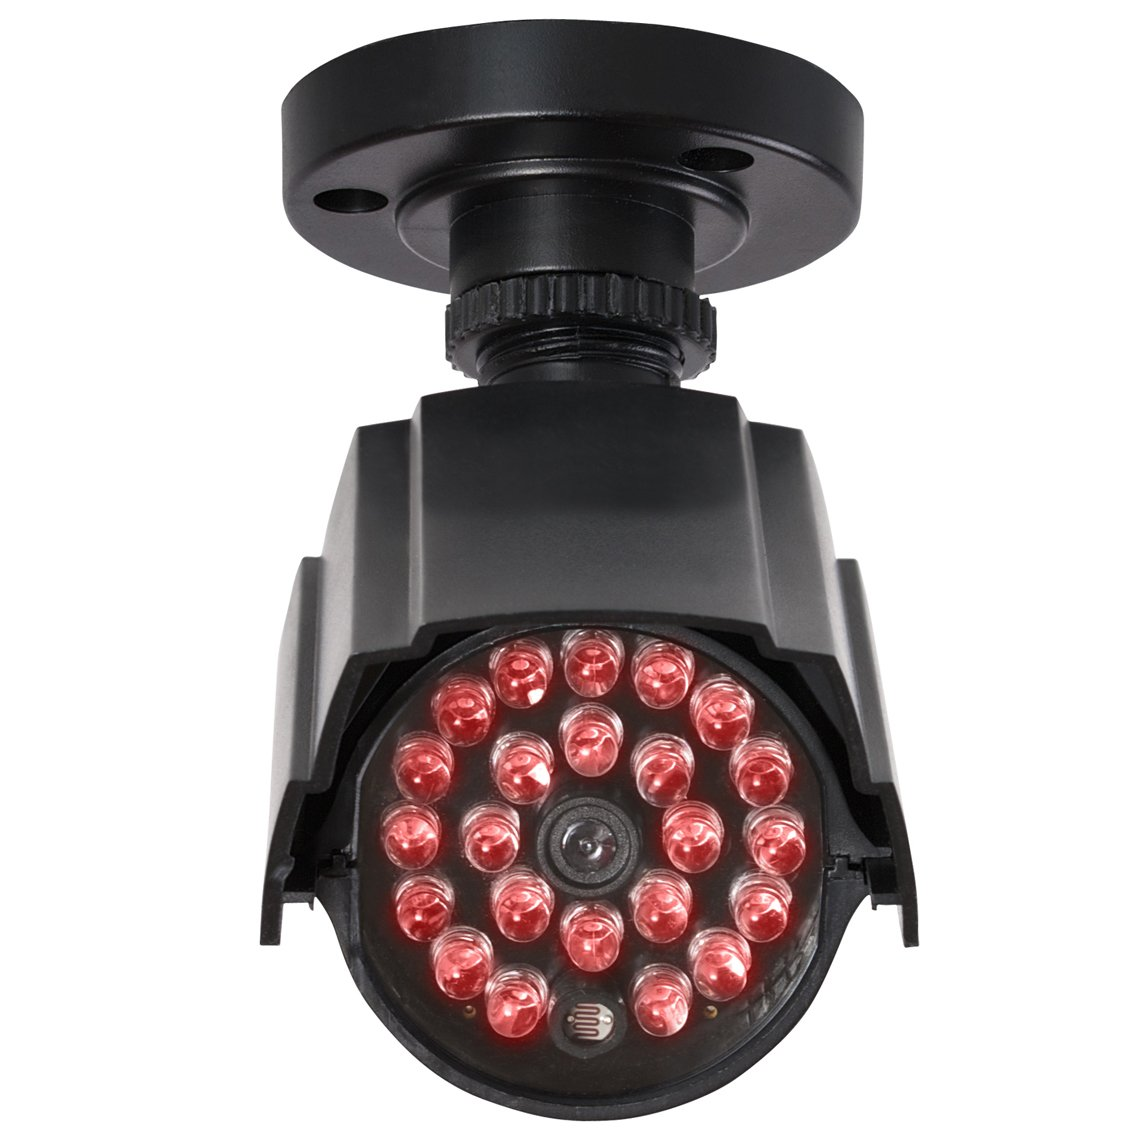 Proper Dummy Dome & Security Camera Kit Negro, Color blanco cámara de seguridad ficticia - Cámaras de seguridad ficticias (Exterior, Negro, Blanco, ...